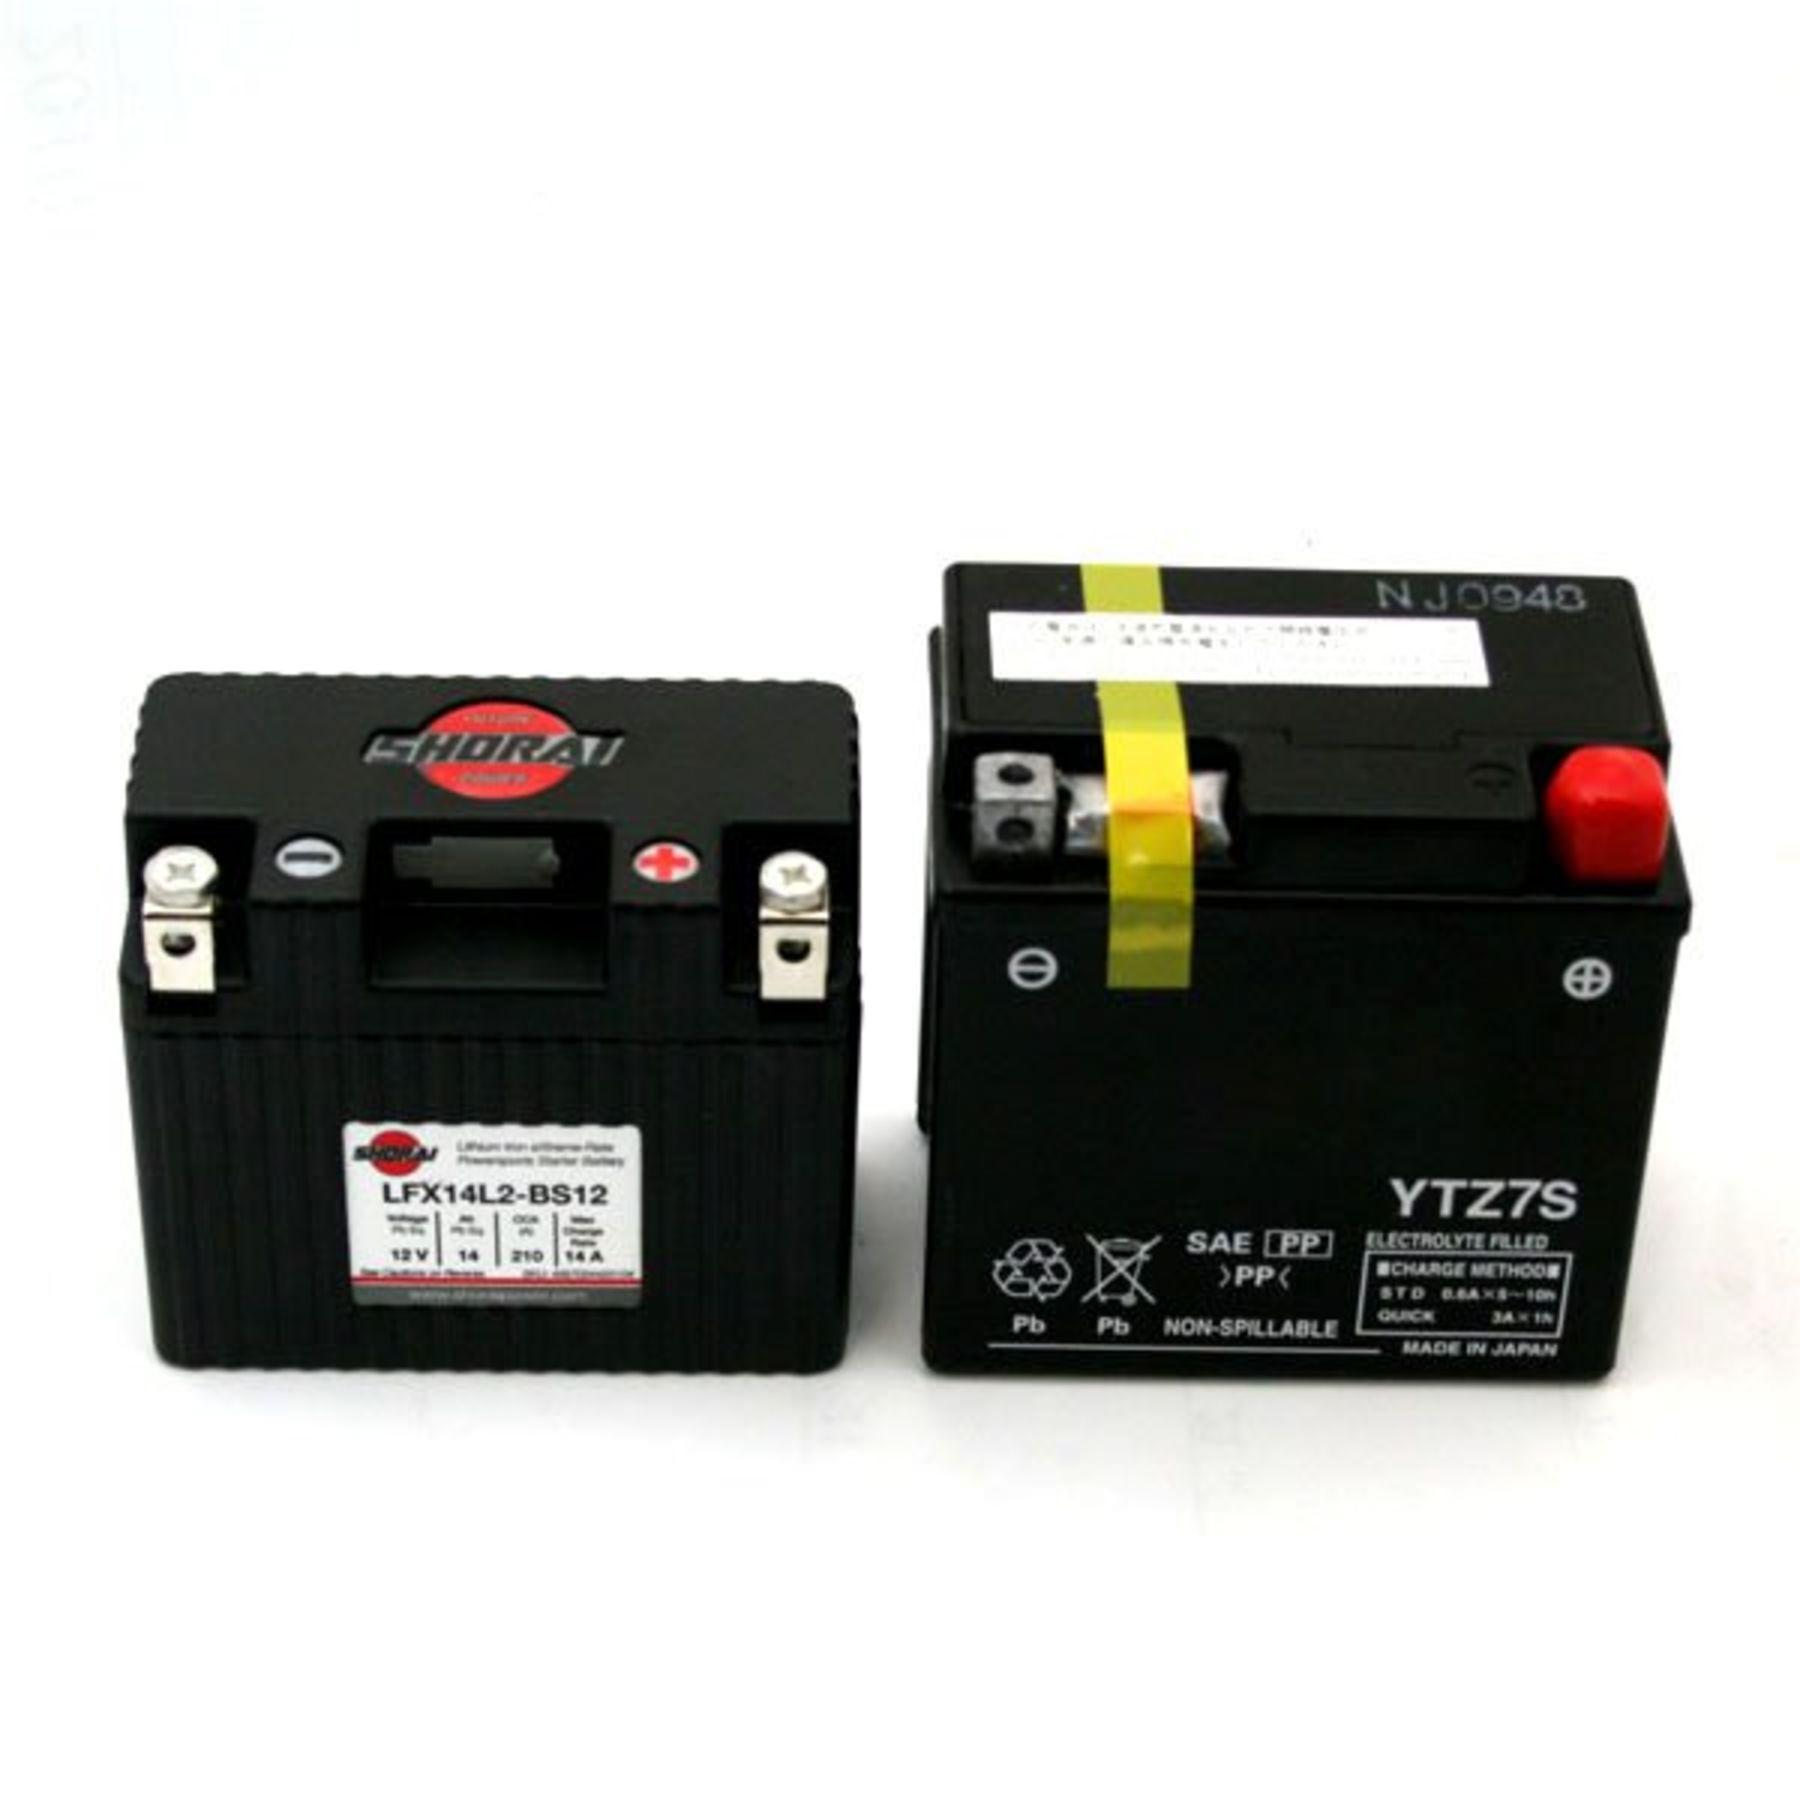 Lifepo4 Battery 14ah 12v Lithium Motorcycle Atv Batteries 12 V Wiring Diagram 350 Cc 500 Us Canada Version Lfx14l2 Bs12